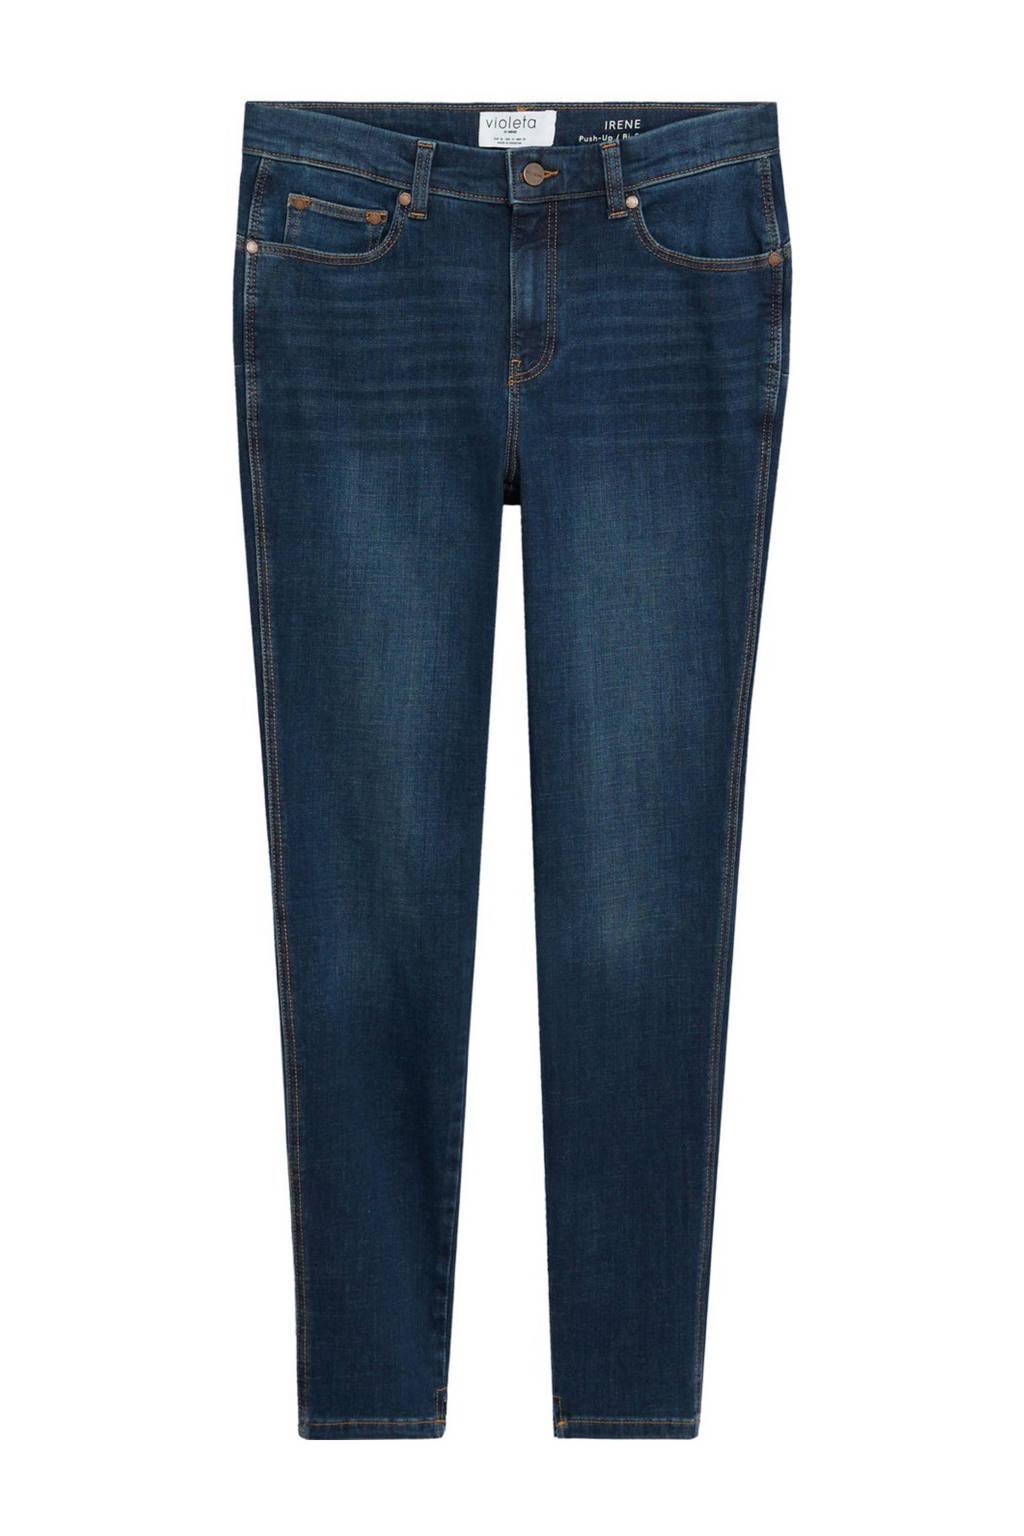 Violeta by Mango push-up skinny jeans Irene Bi-stretch darkblue, DarkBlue